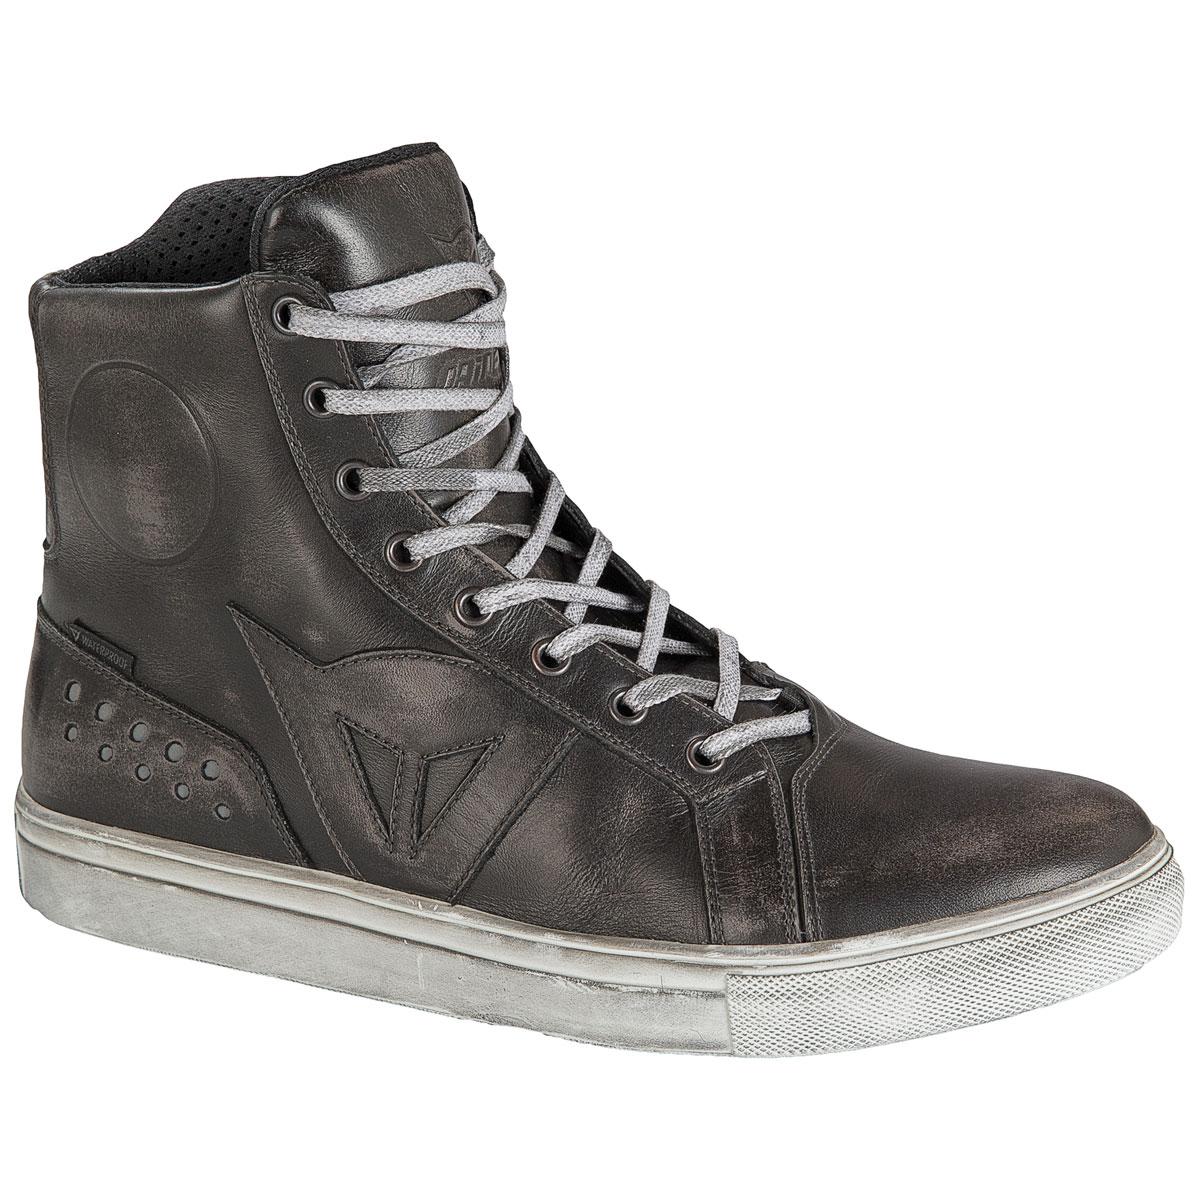 Dainese Men's Street Rocker D-WP Black Shoes